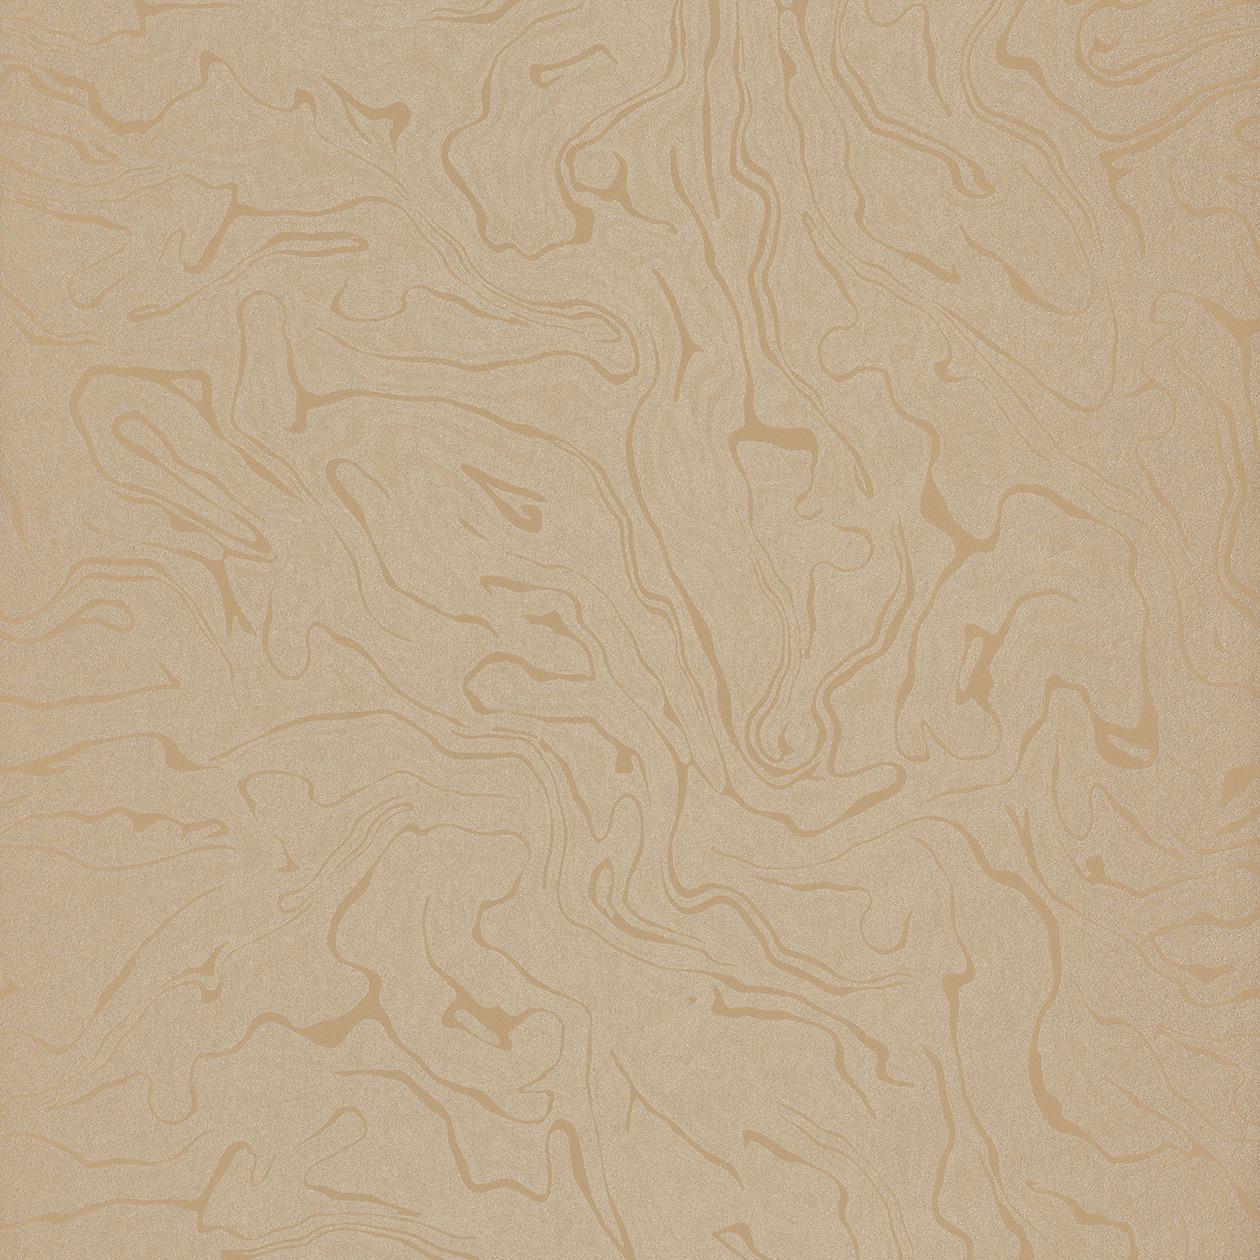 Французские обои Caselio,  коллекция Trio, артикулTIO68031150